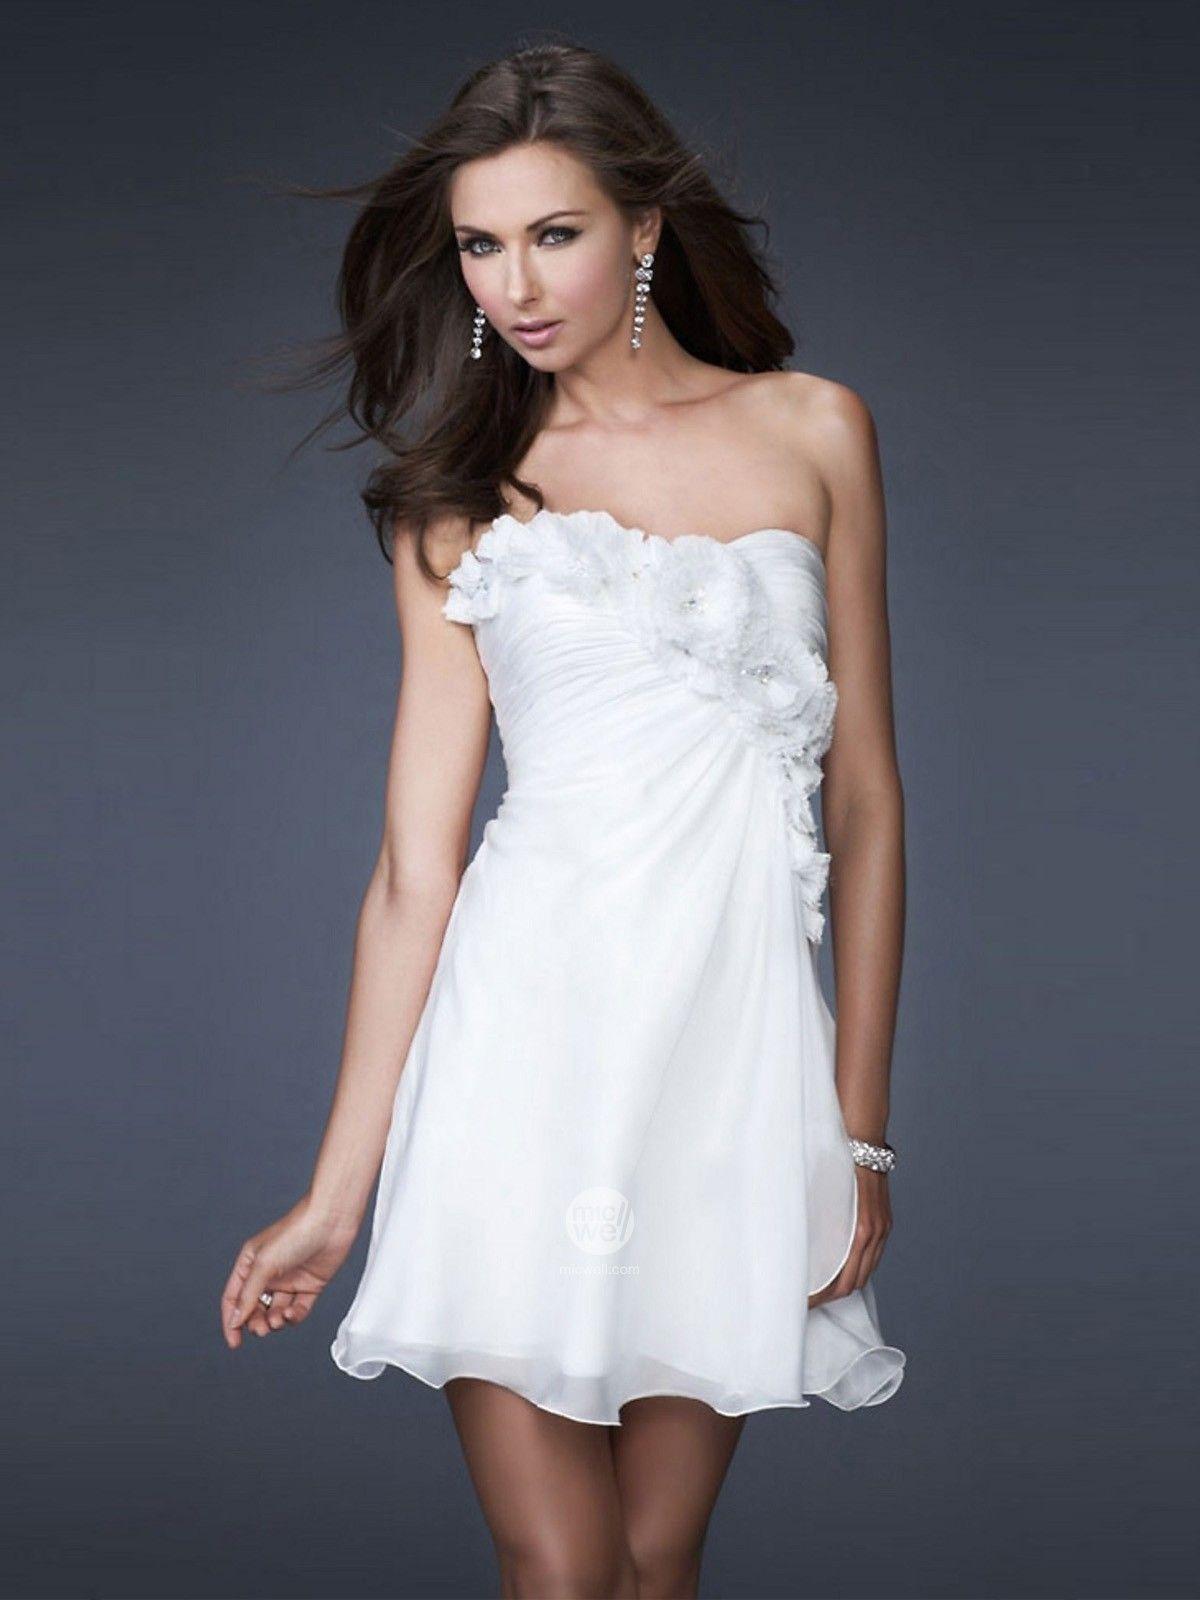 white dress - Penelusuran Google | White | Pinterest | Fashion ...